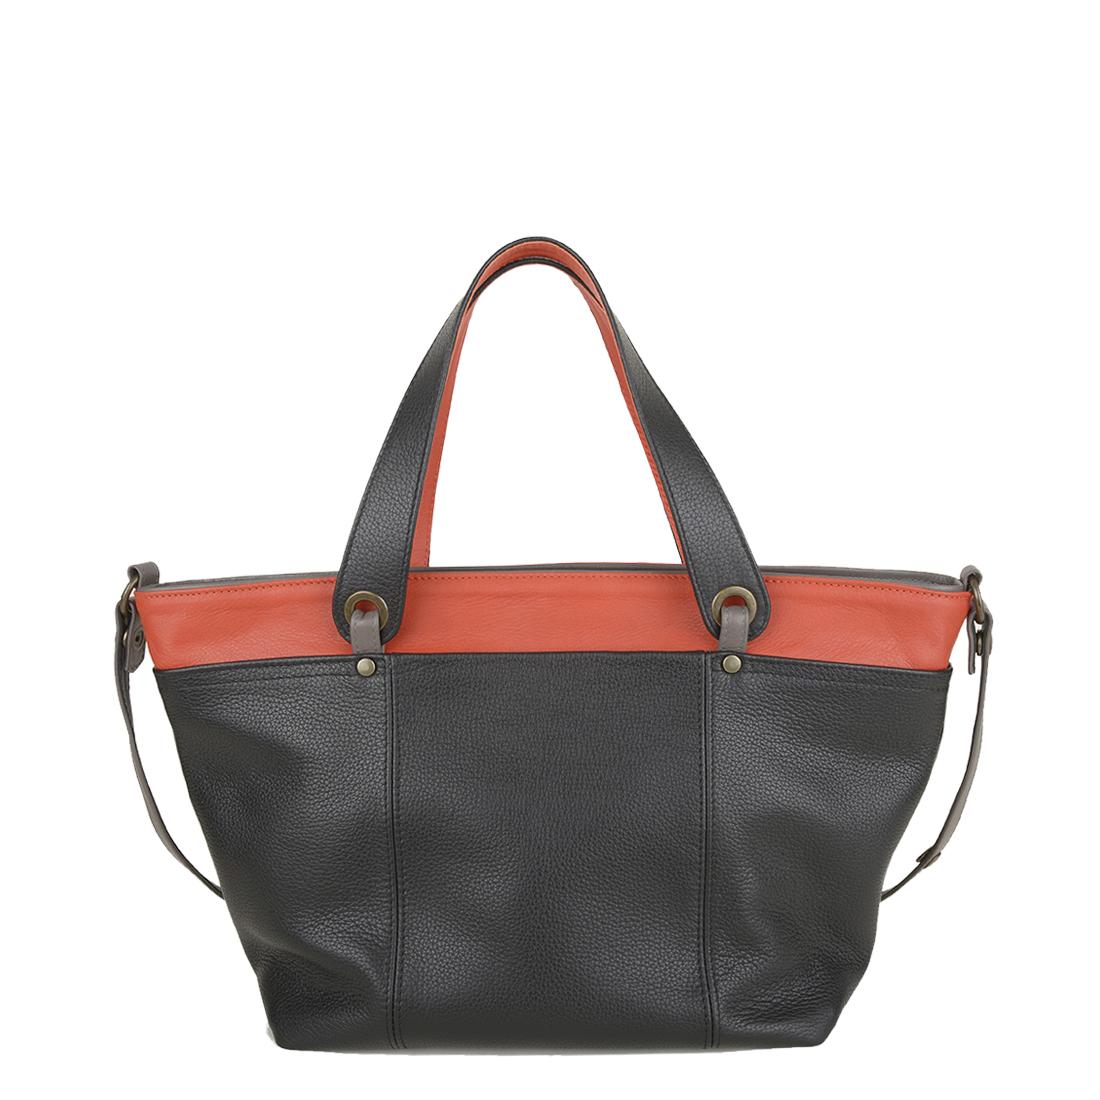 Lucy Black Orange Leather Tote Bag